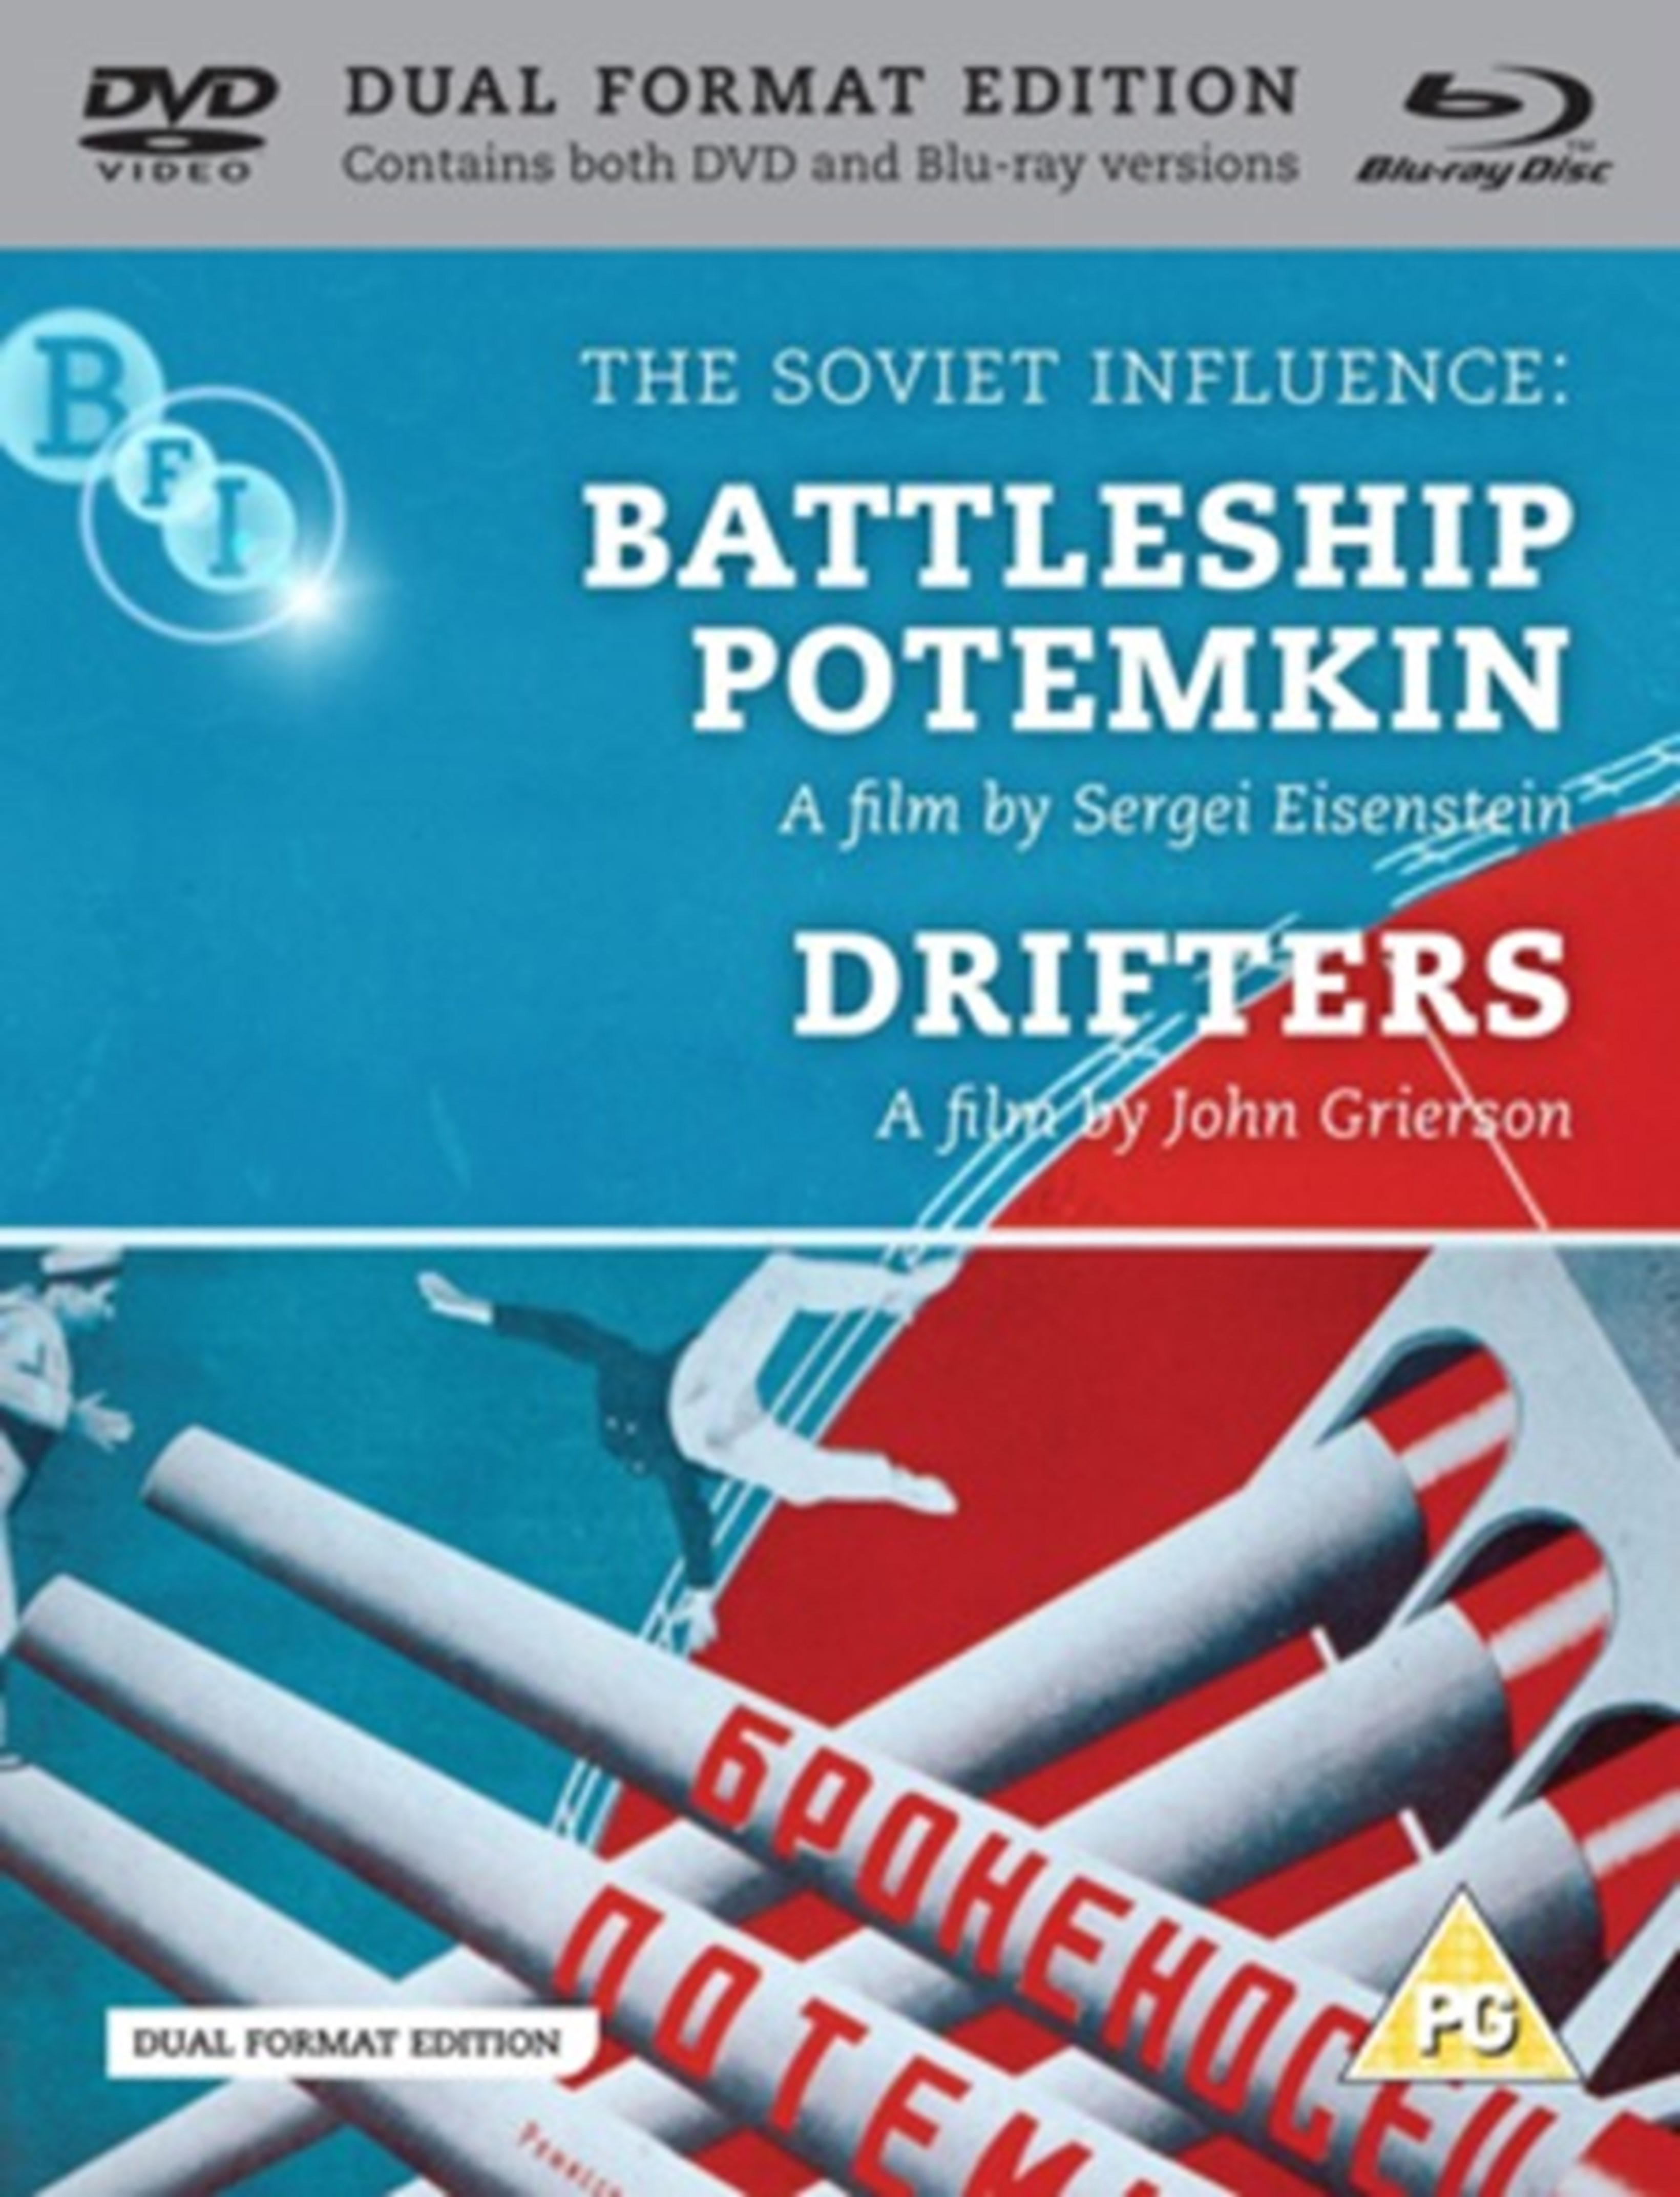 Battleship Potemkin/Drifters - 1